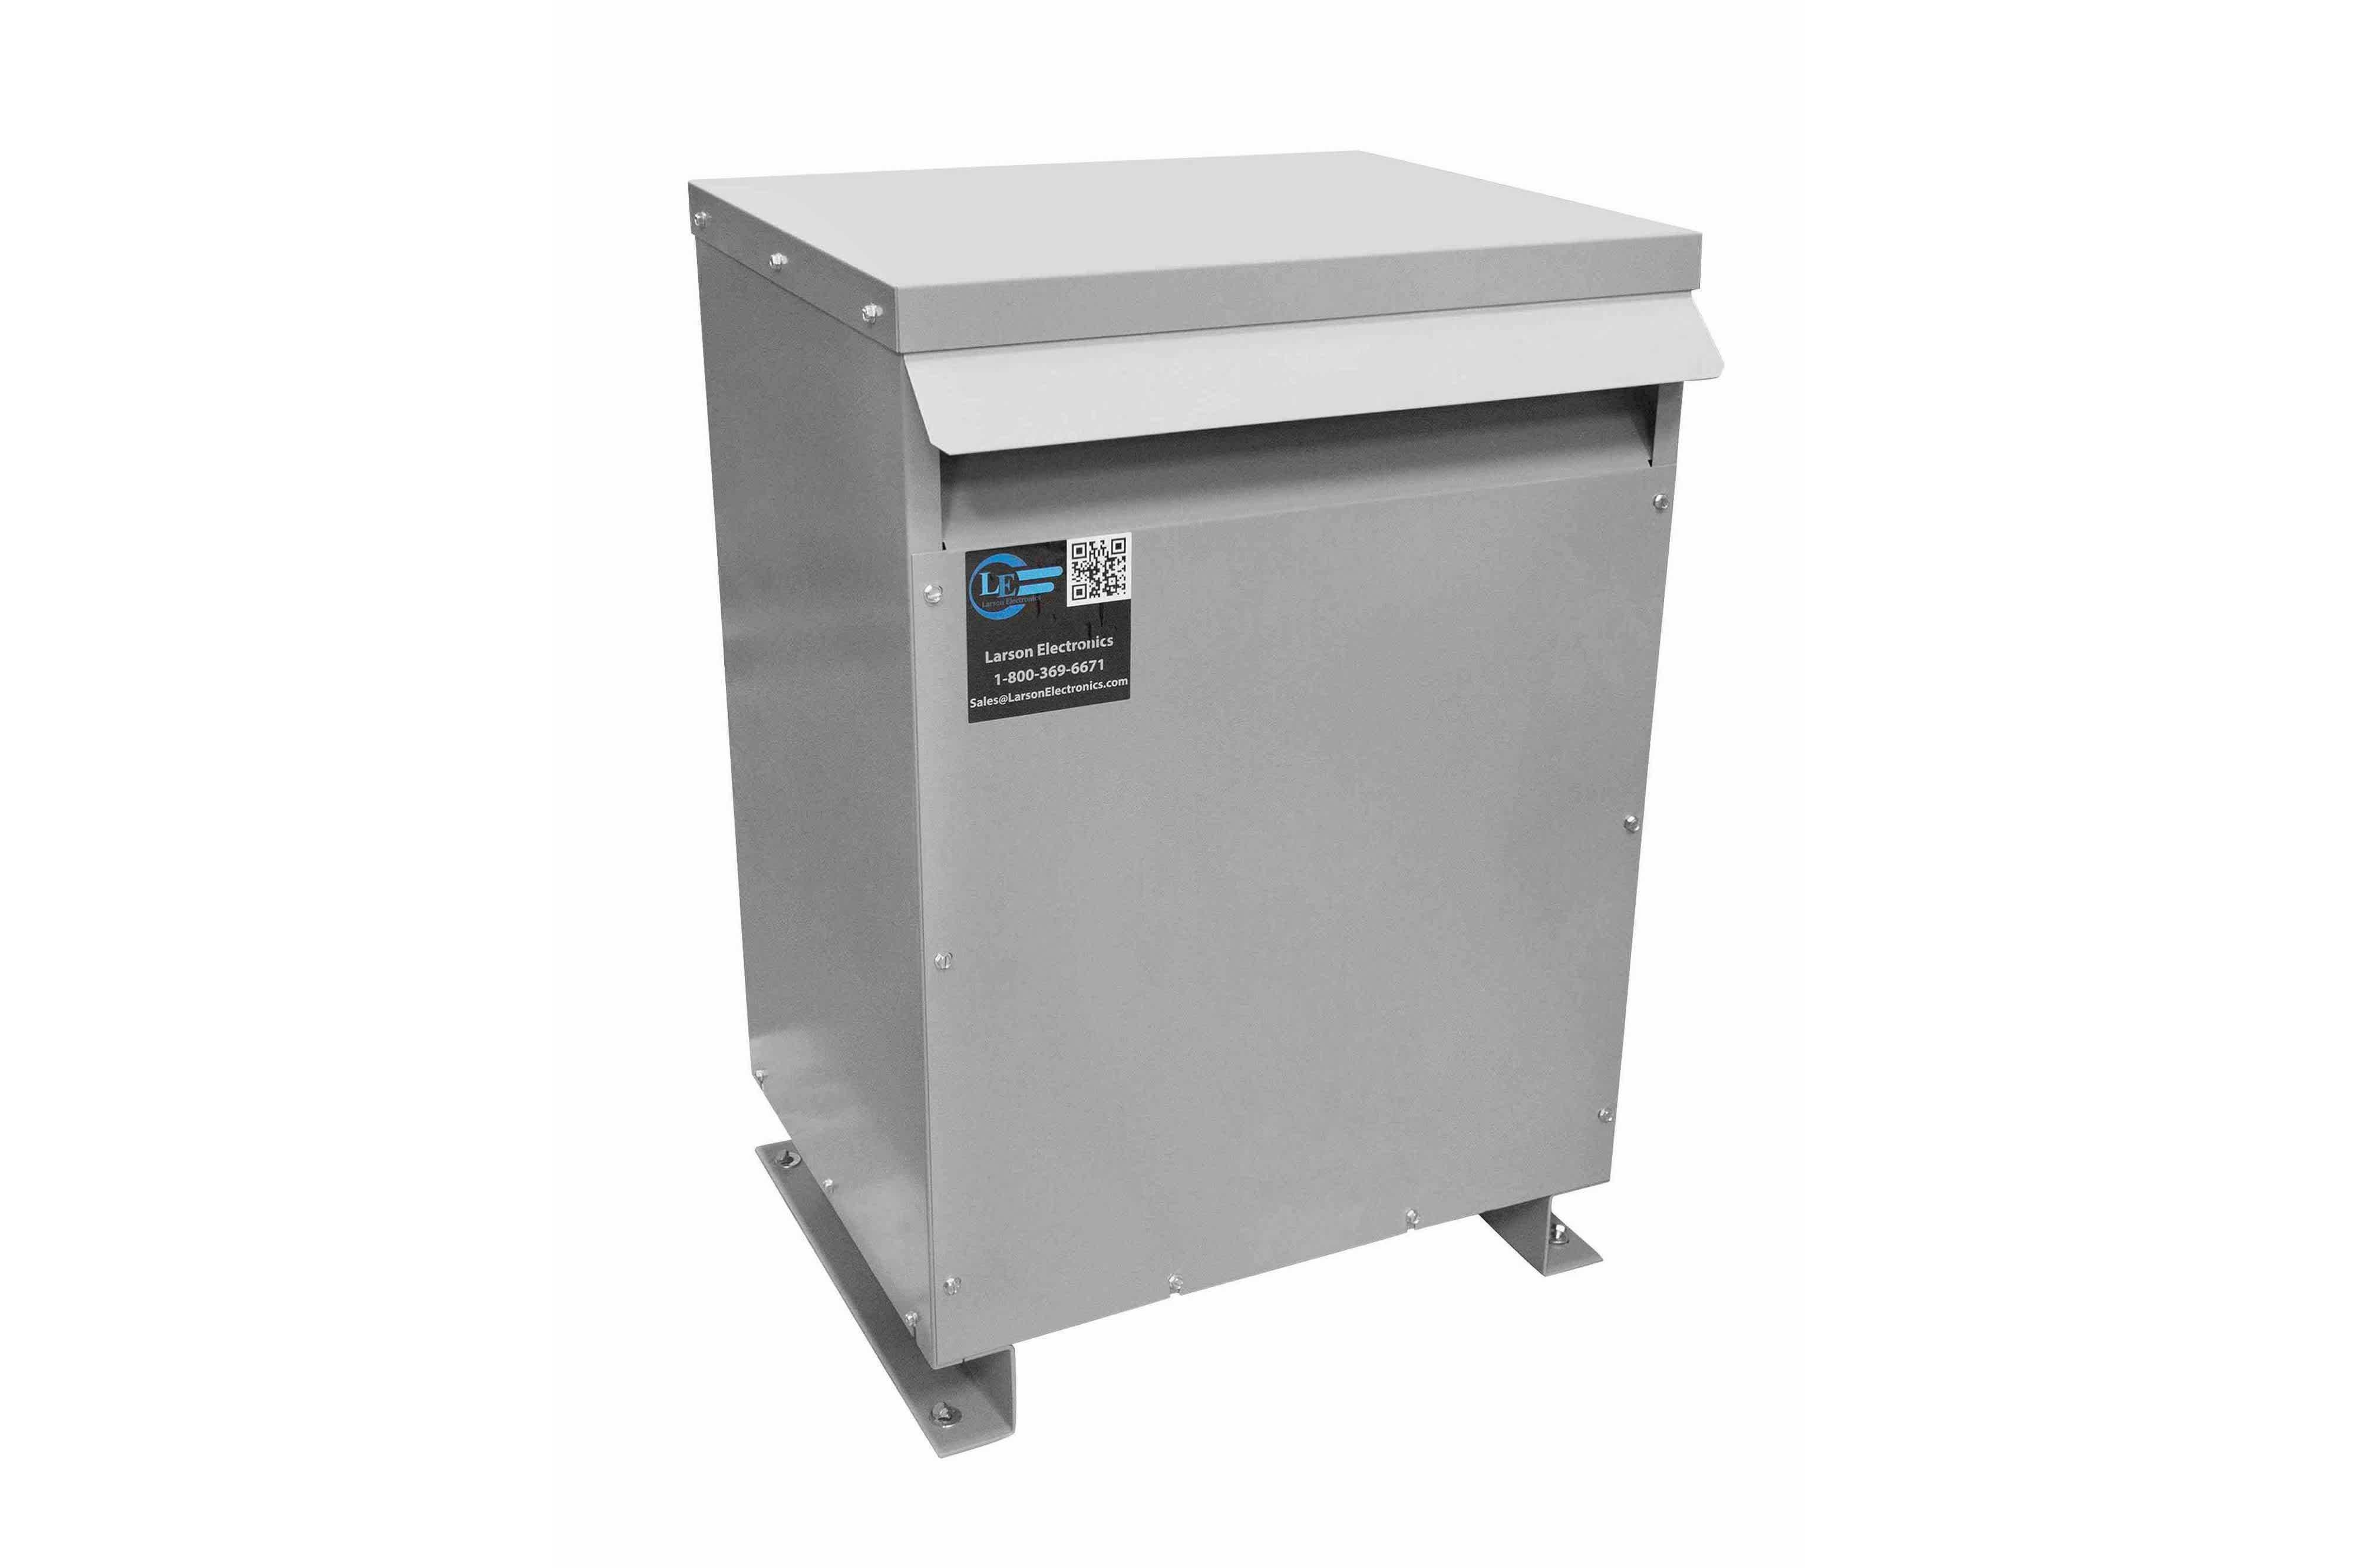 400 kVA 3PH DOE Transformer, 240V Delta Primary, 380Y/220 Wye-N Secondary, N3R, Ventilated, 60 Hz